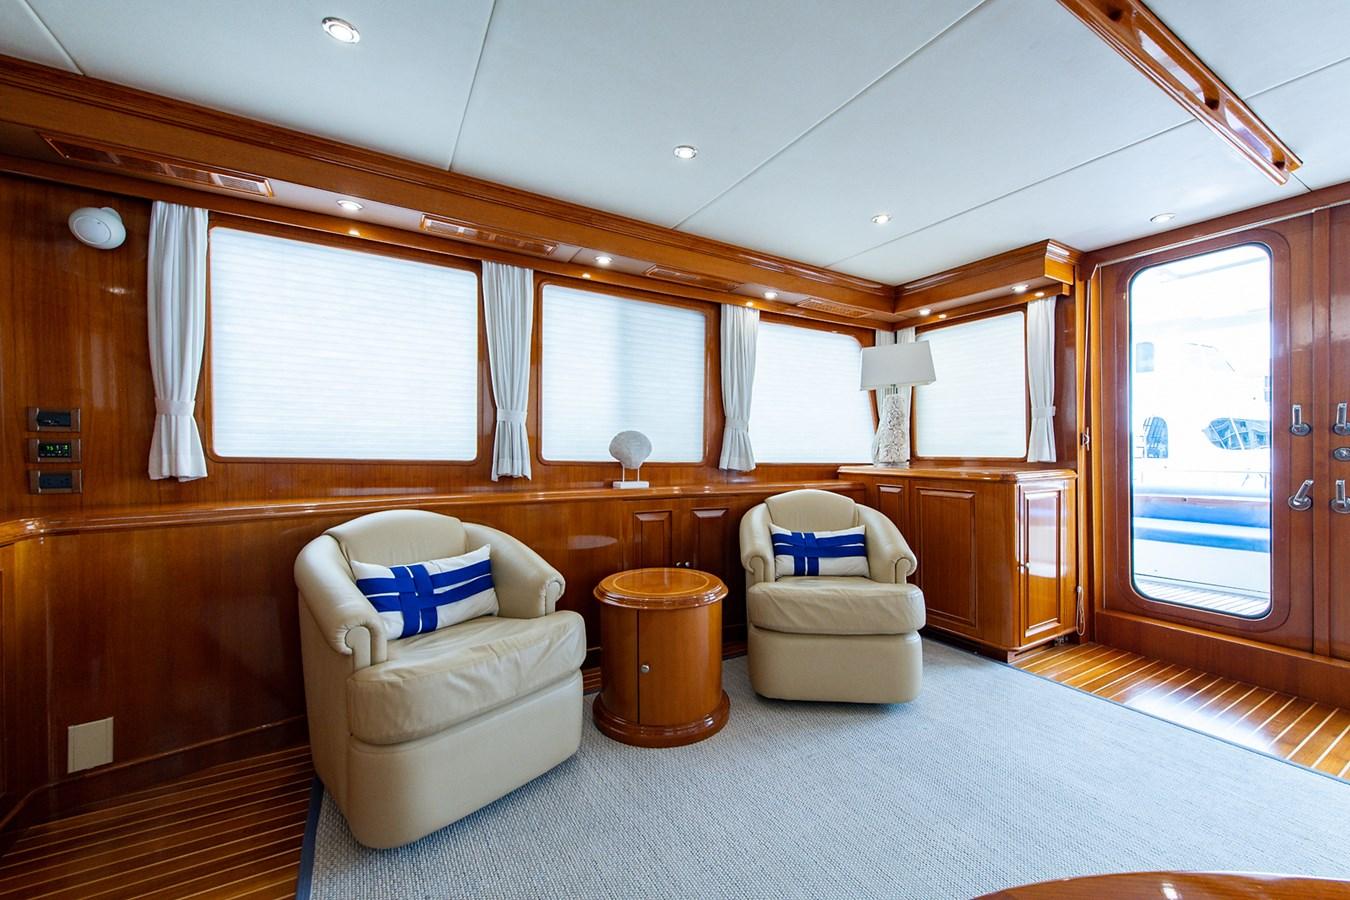 Tout Va Bien_Salon3 2005 GRAND BANKS 64 Aleutian RP Motor Yacht 2726127